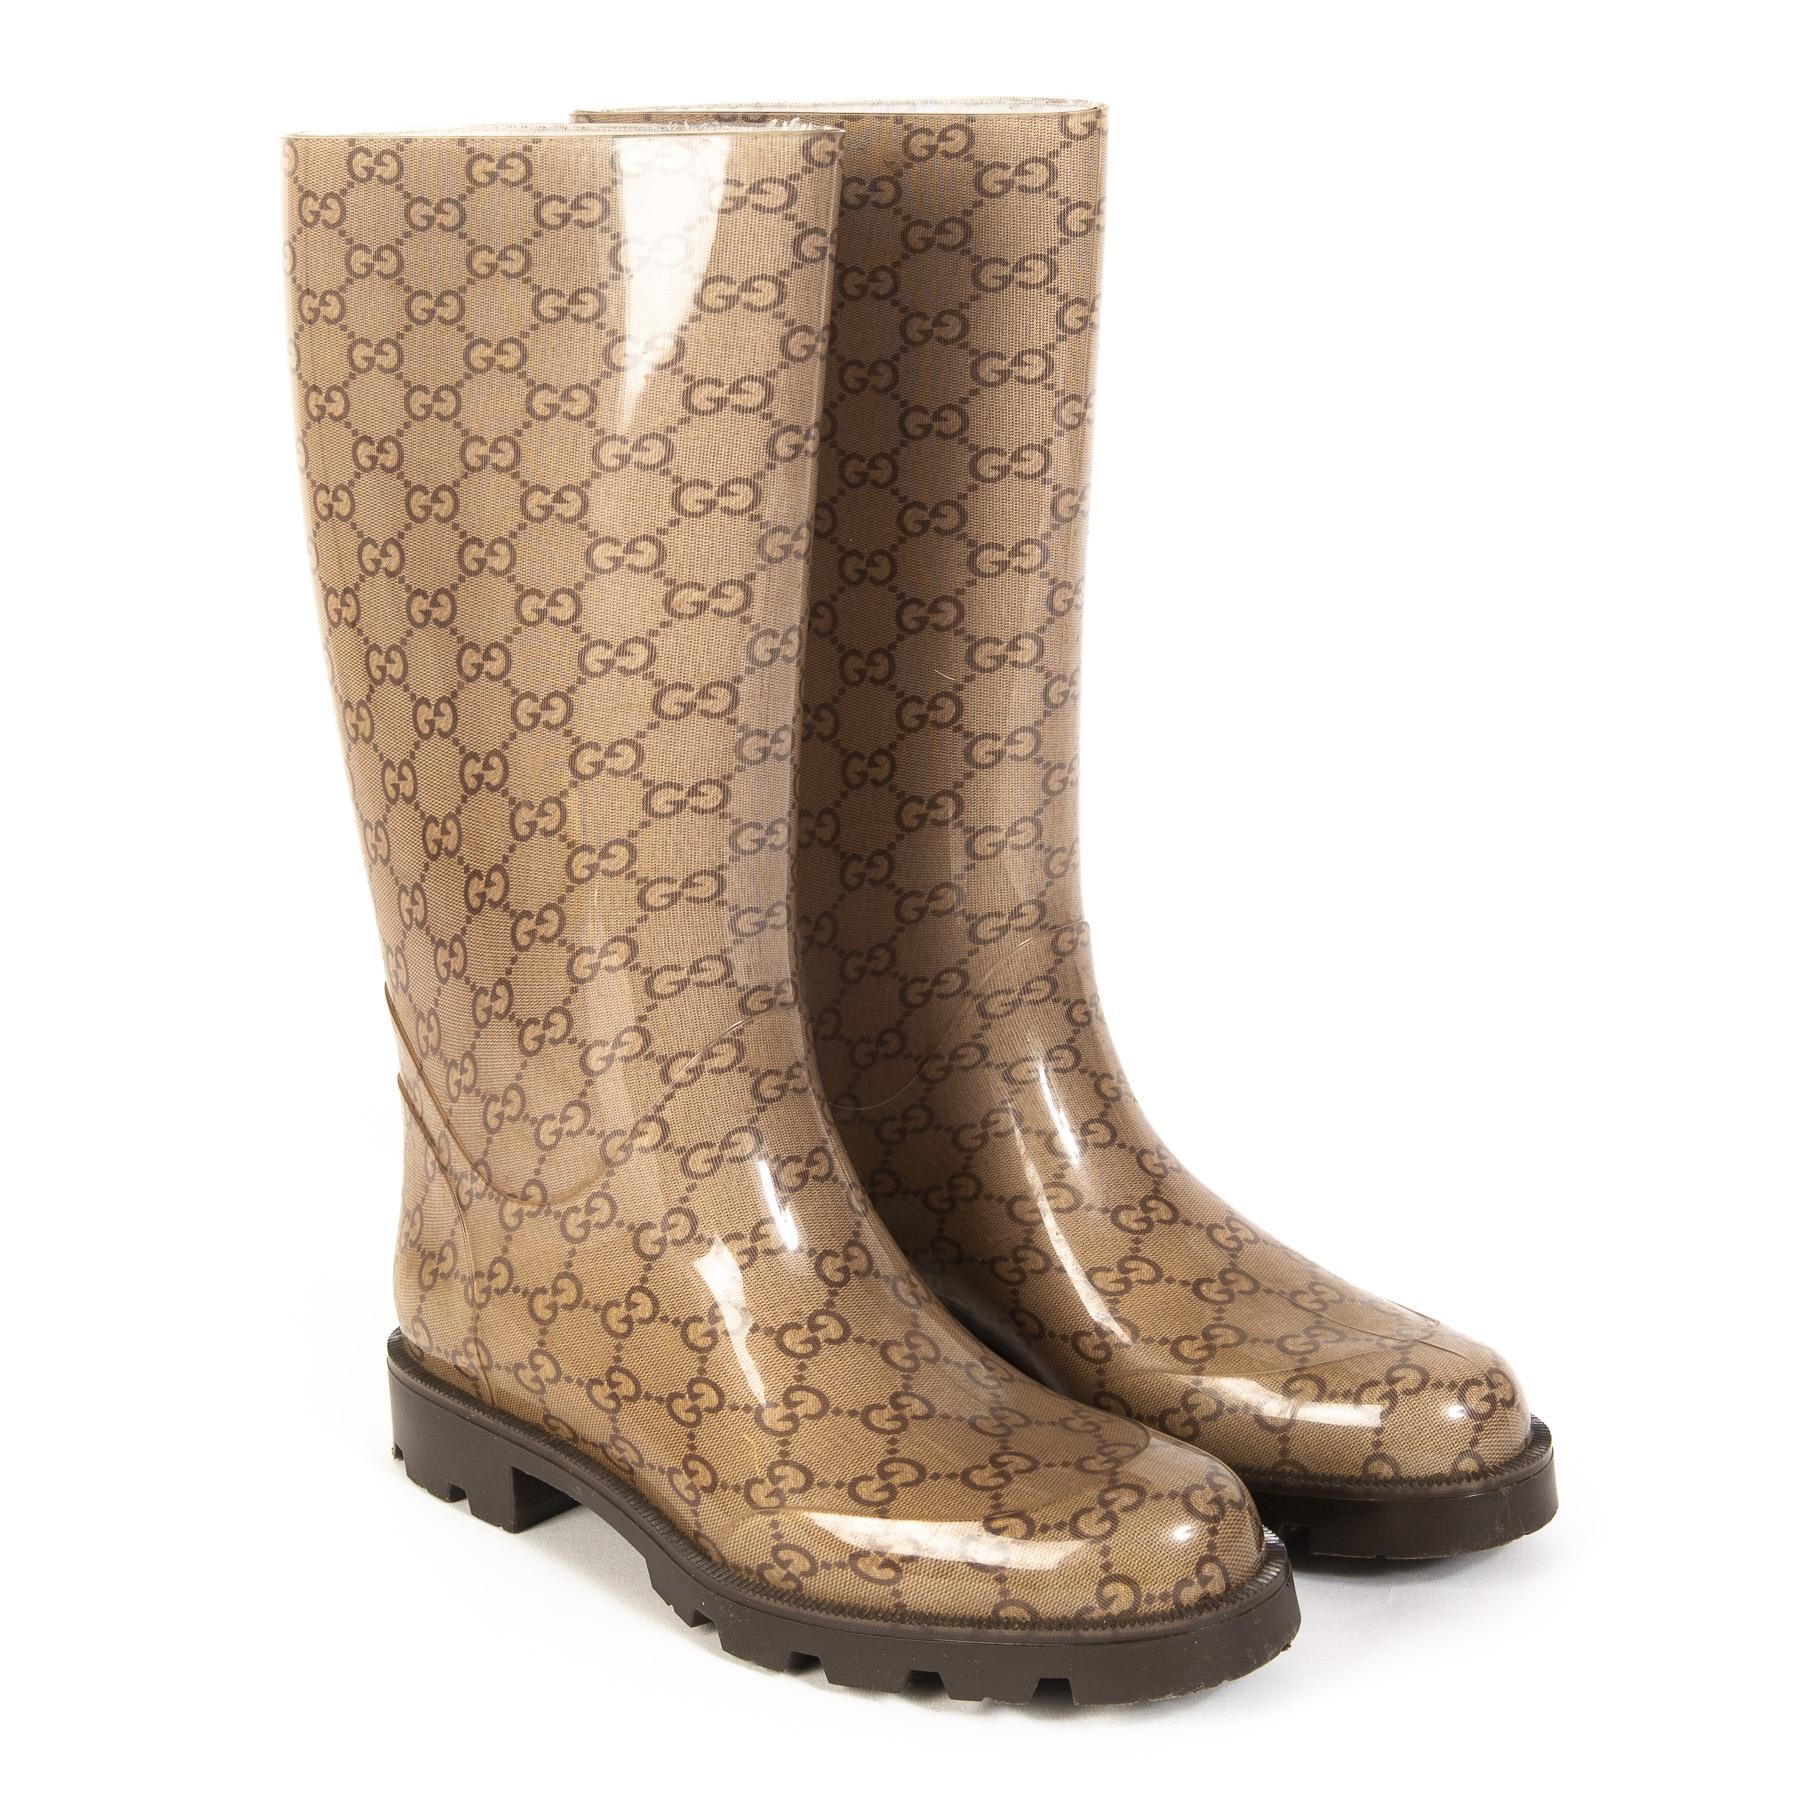 Gucci Monogram Rain Boots - Size 37